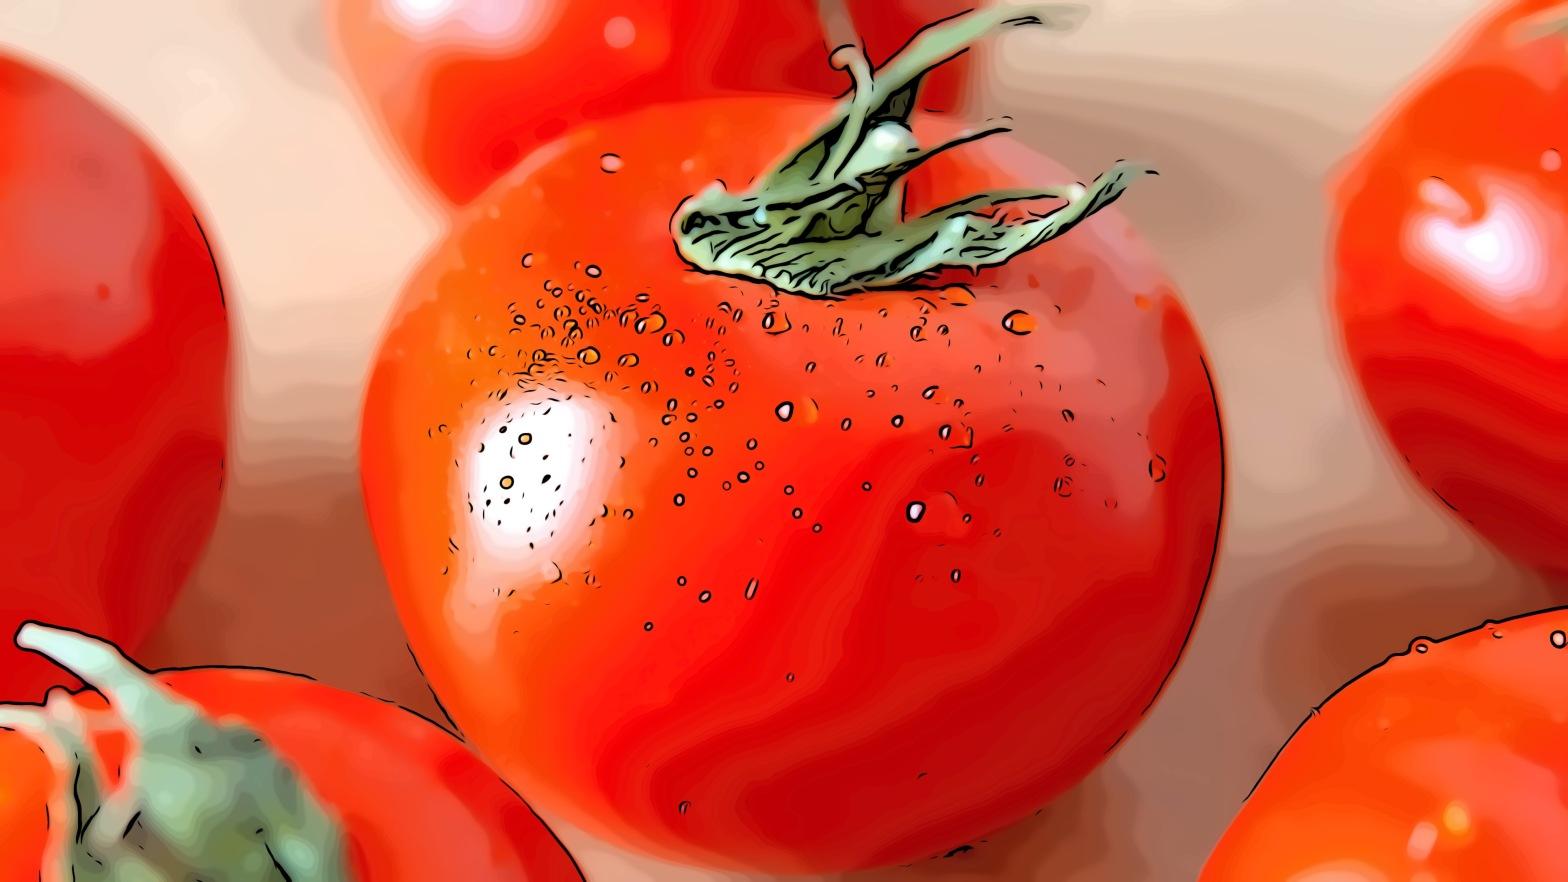 Tomato header comic